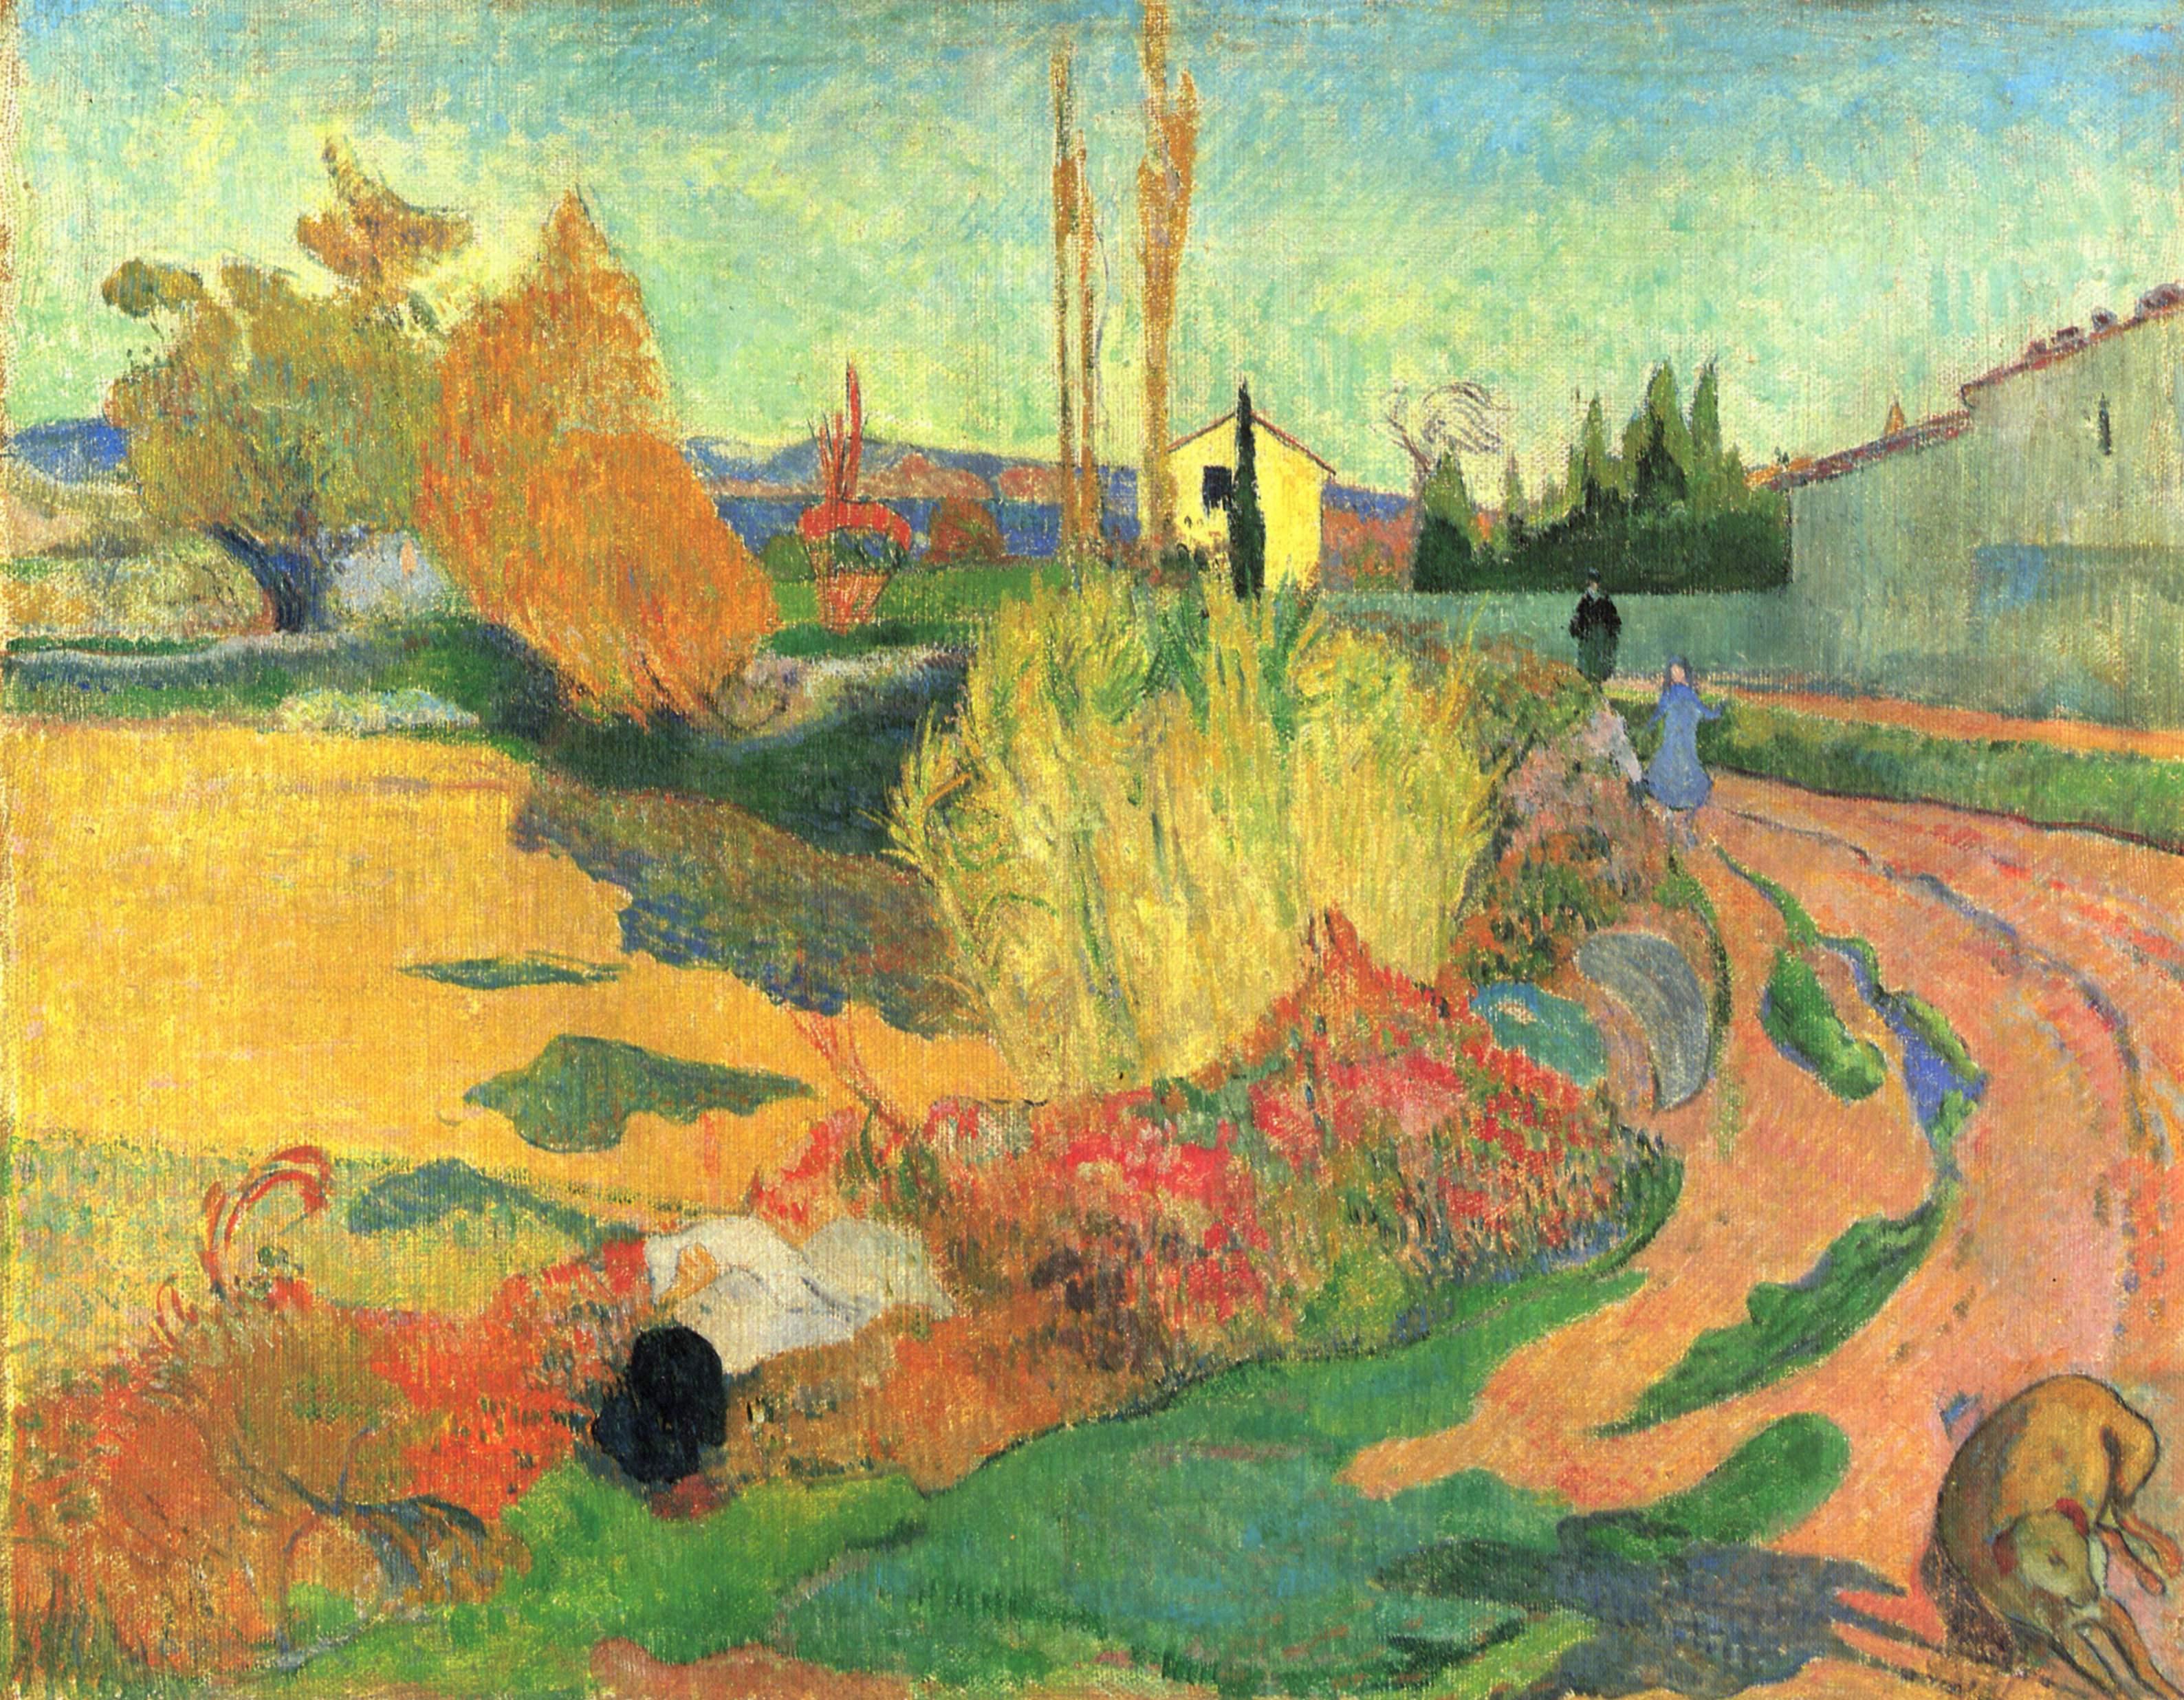 File:Paul Gauguin 043.jpg - Wikimedia Commons